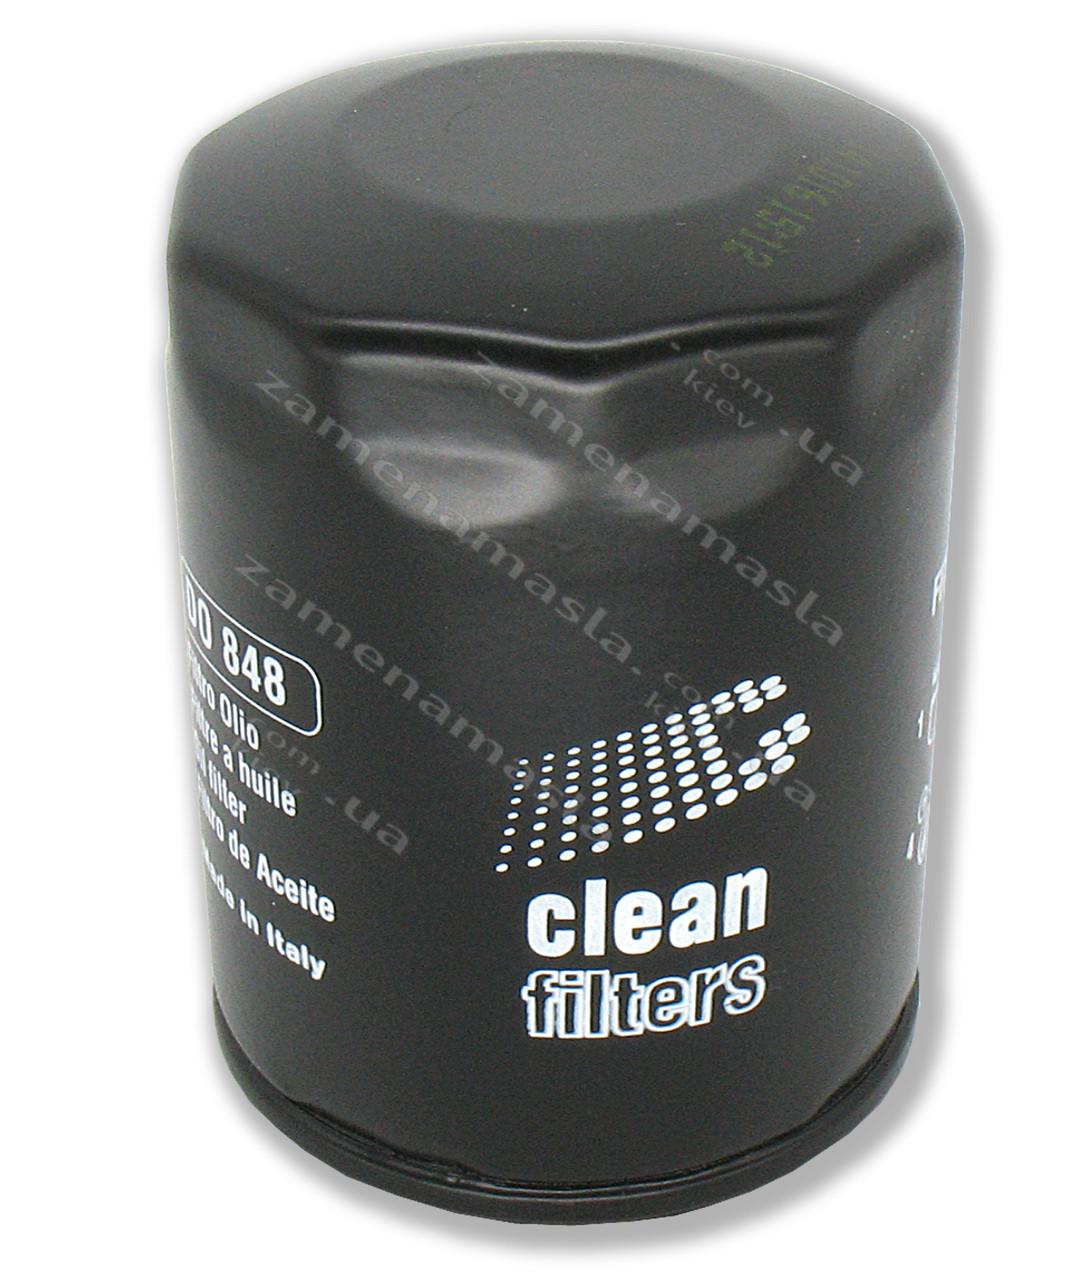 Clean filters DO848 аналог SM-130 на Alfa Romeo, Fiat, Lancia, Seat